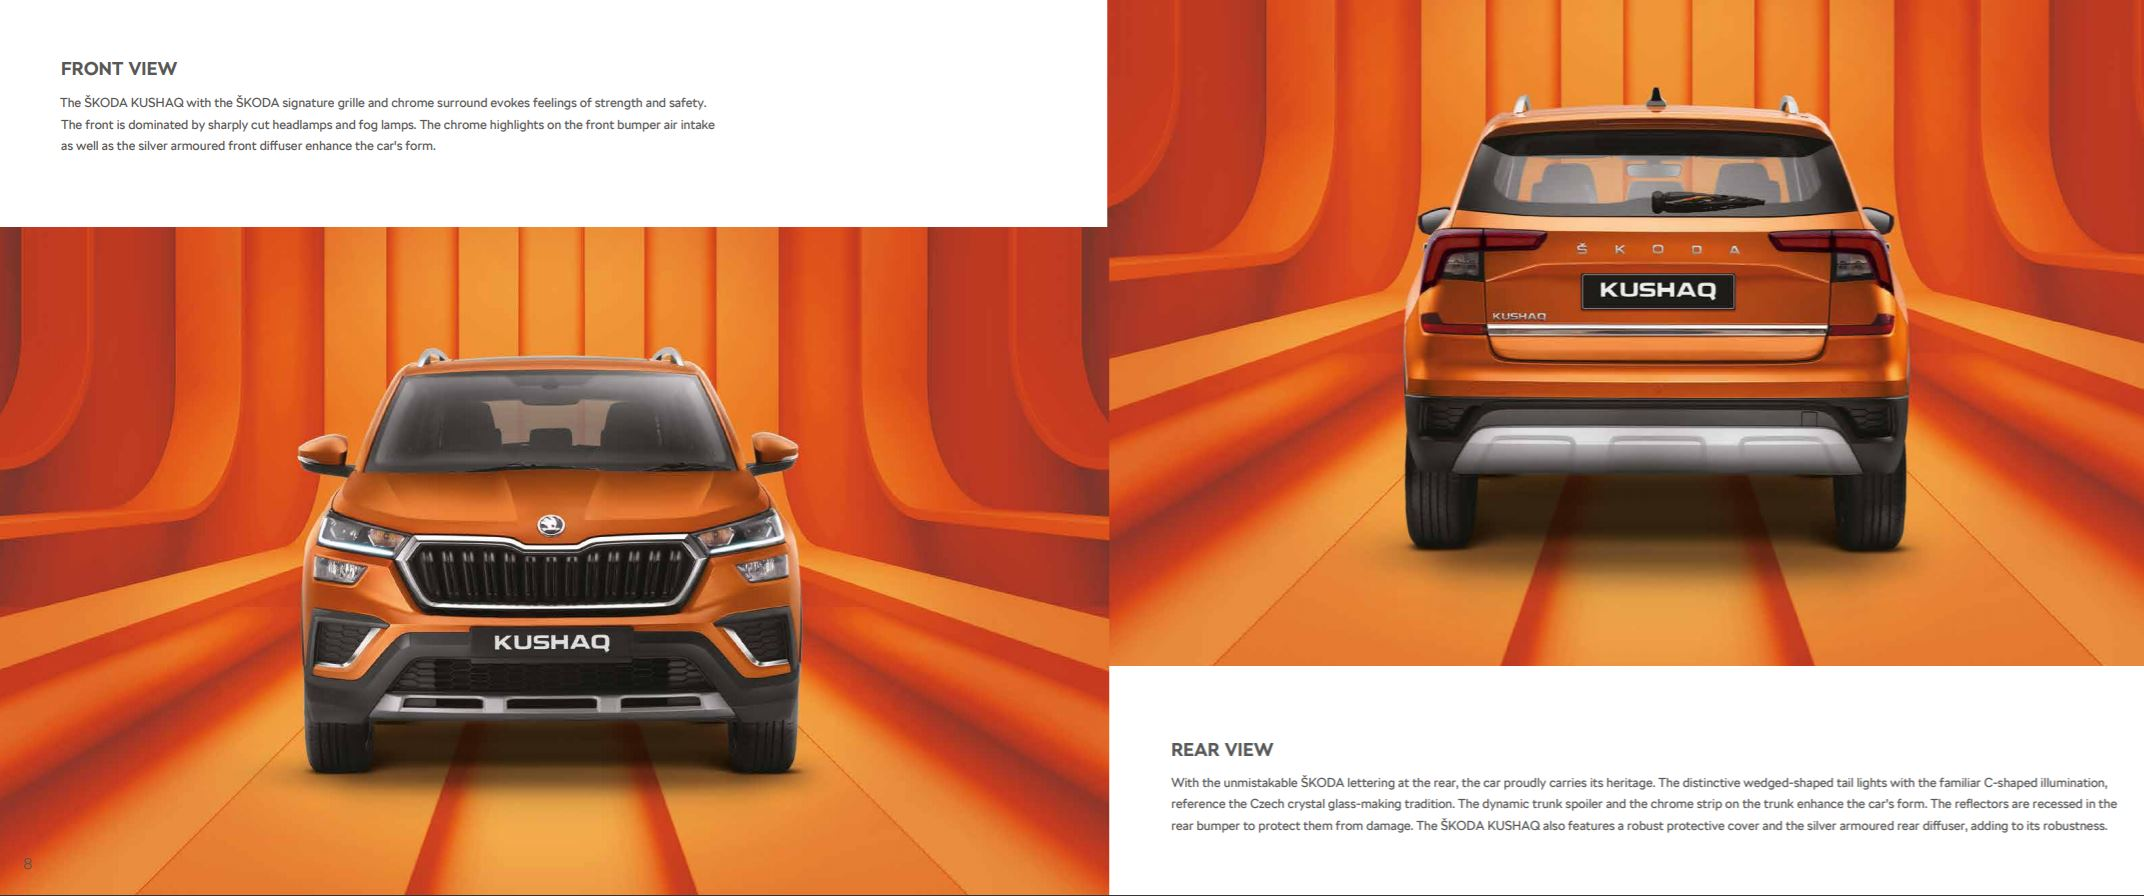 skoda kushaq brochure front and rear view